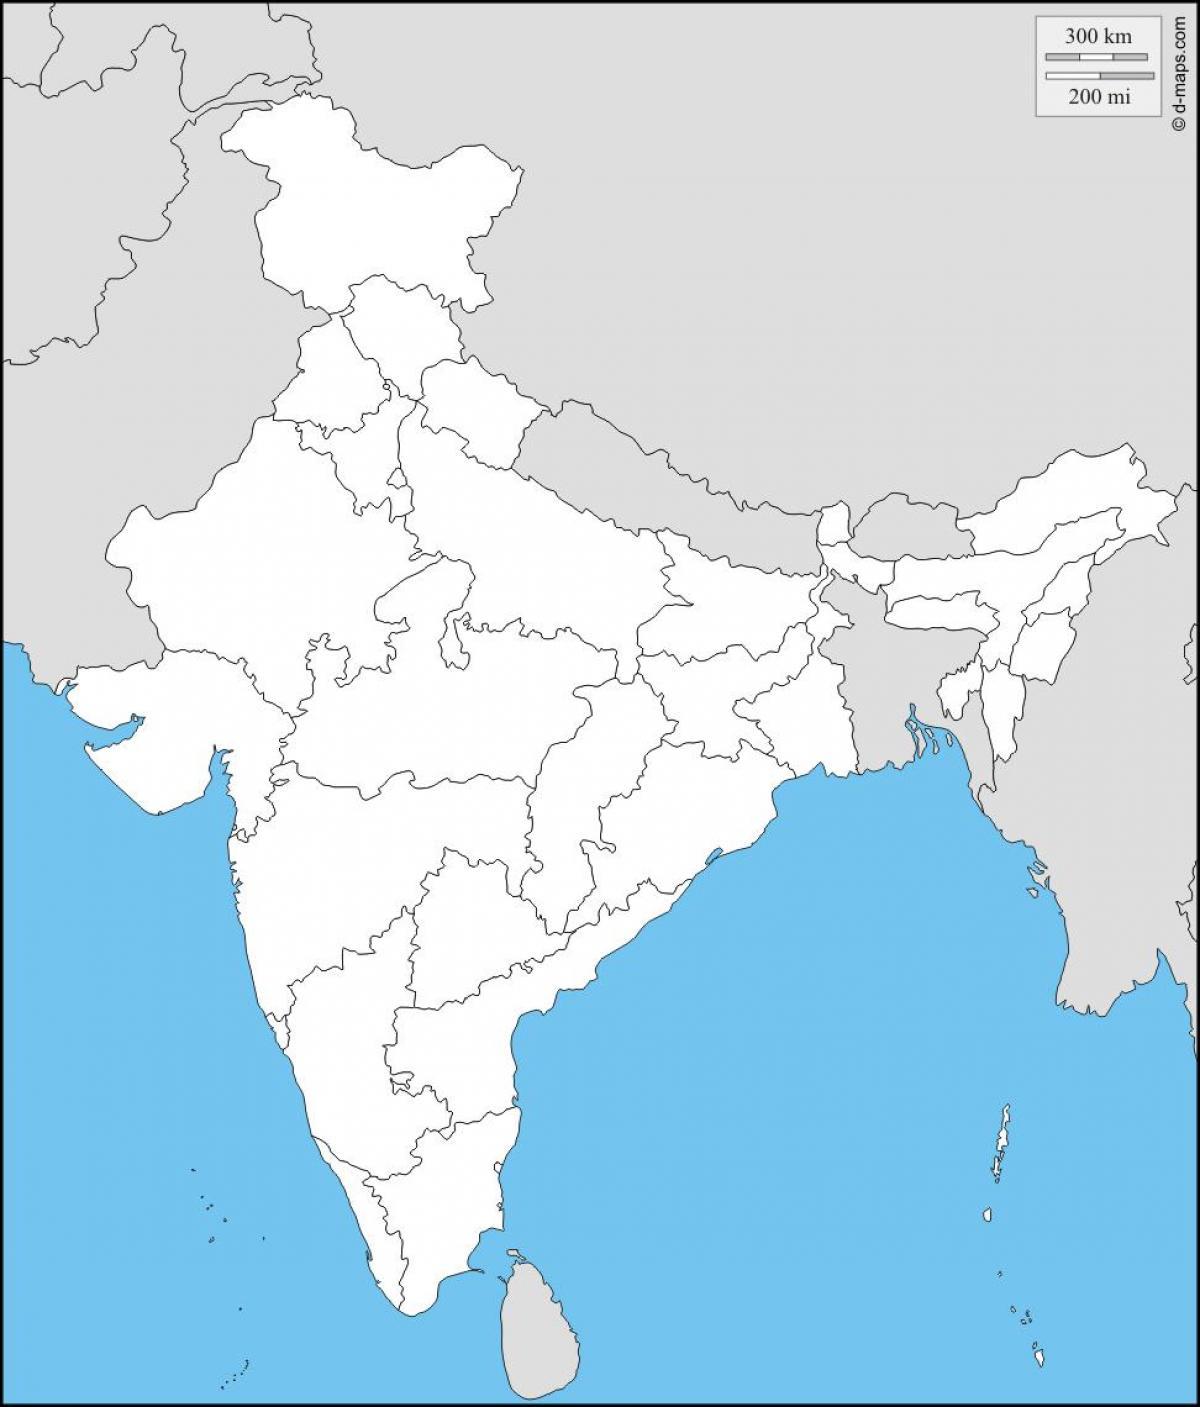 Carte Asie Vierge.Carte Vierge De L Inde Physique Physique De La Carte Vierge De L